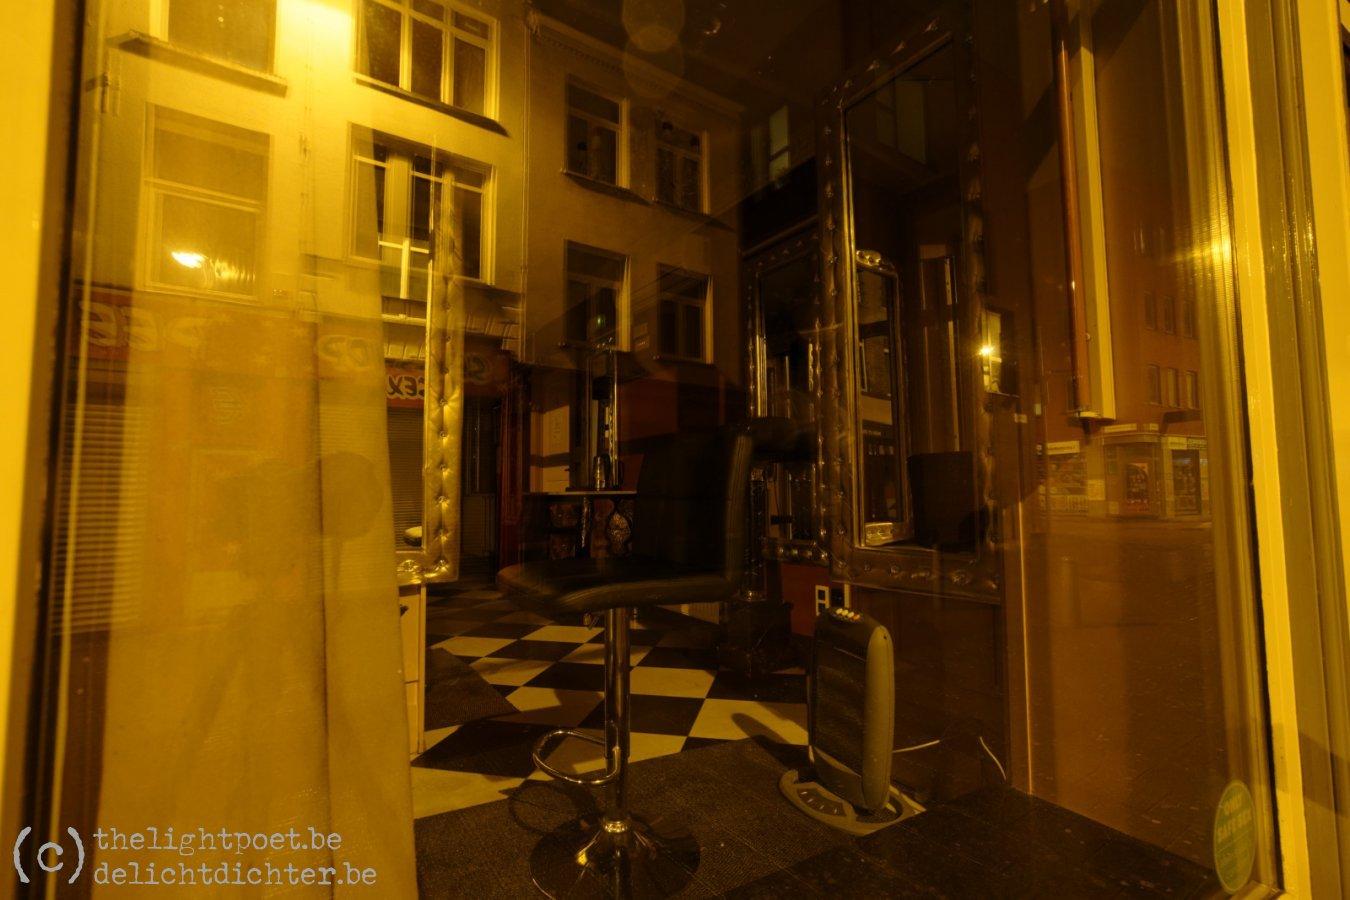 2020_03_Antwerpen_20200320_205423_DxO_PL3_1600px